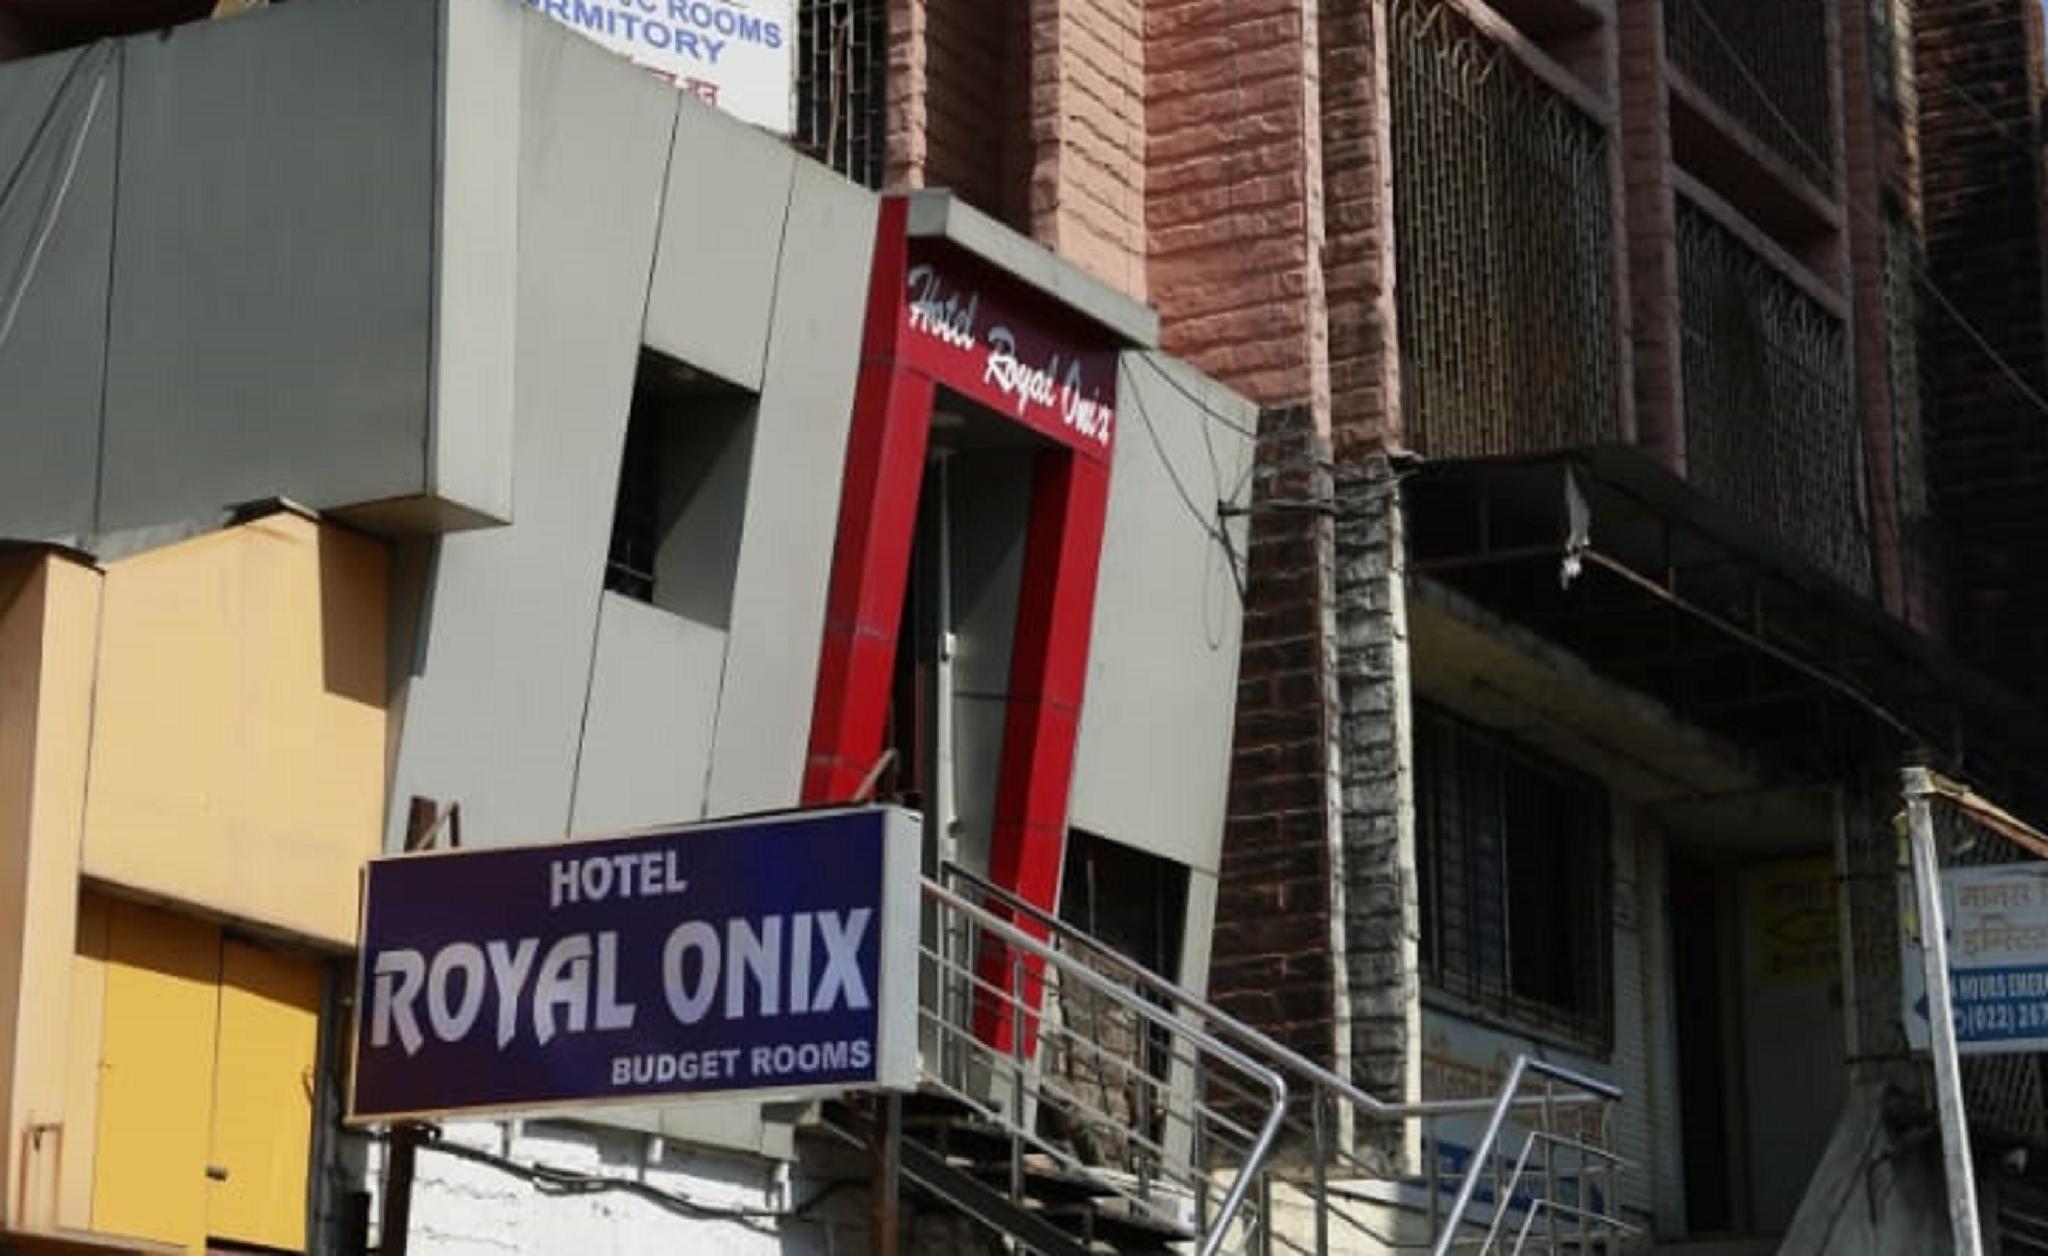 Hotel Royal Onix